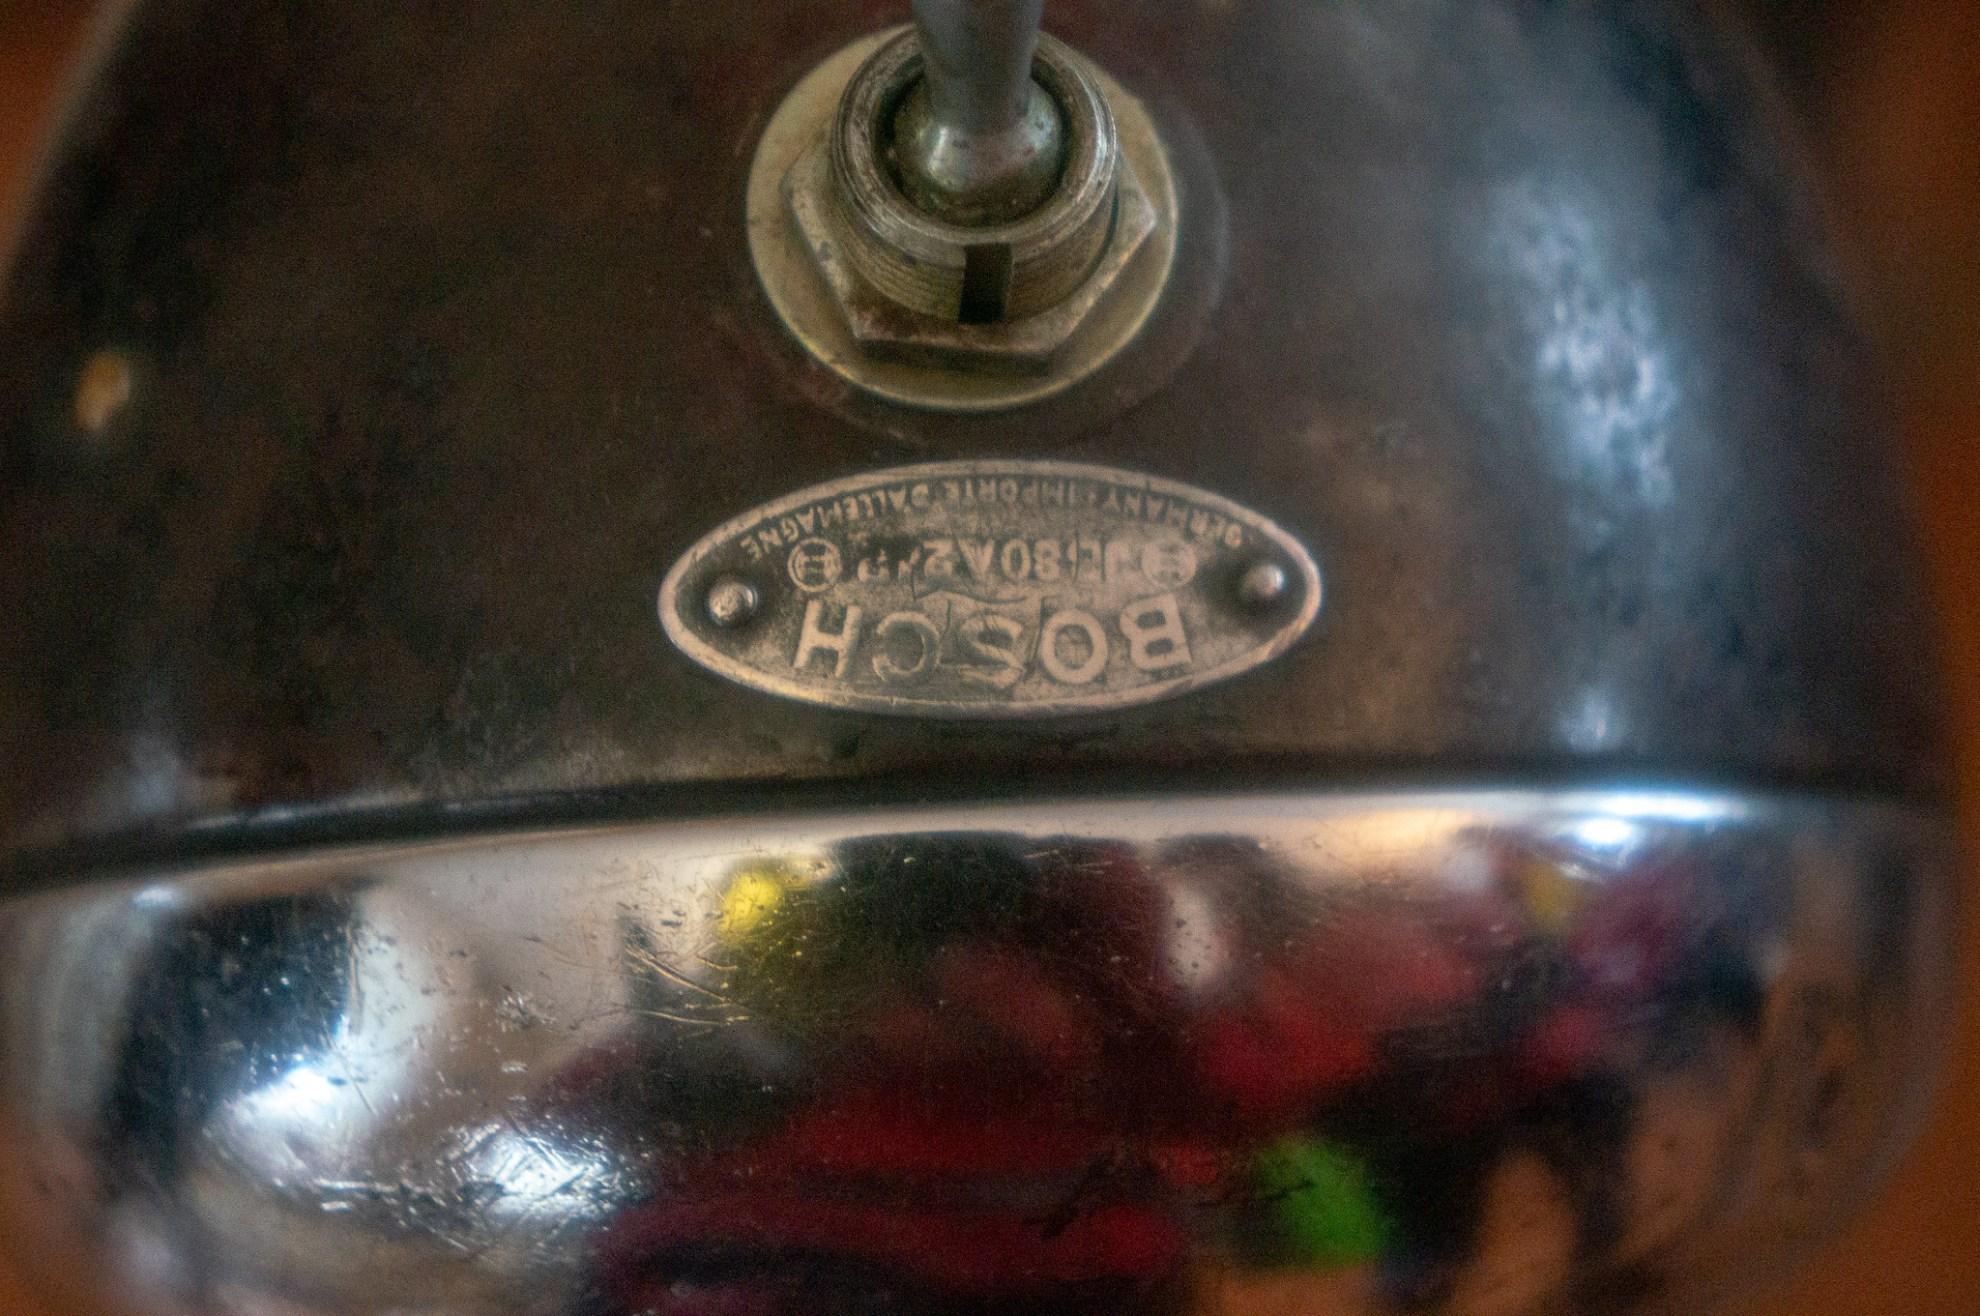 Bosh - велосипедная фара